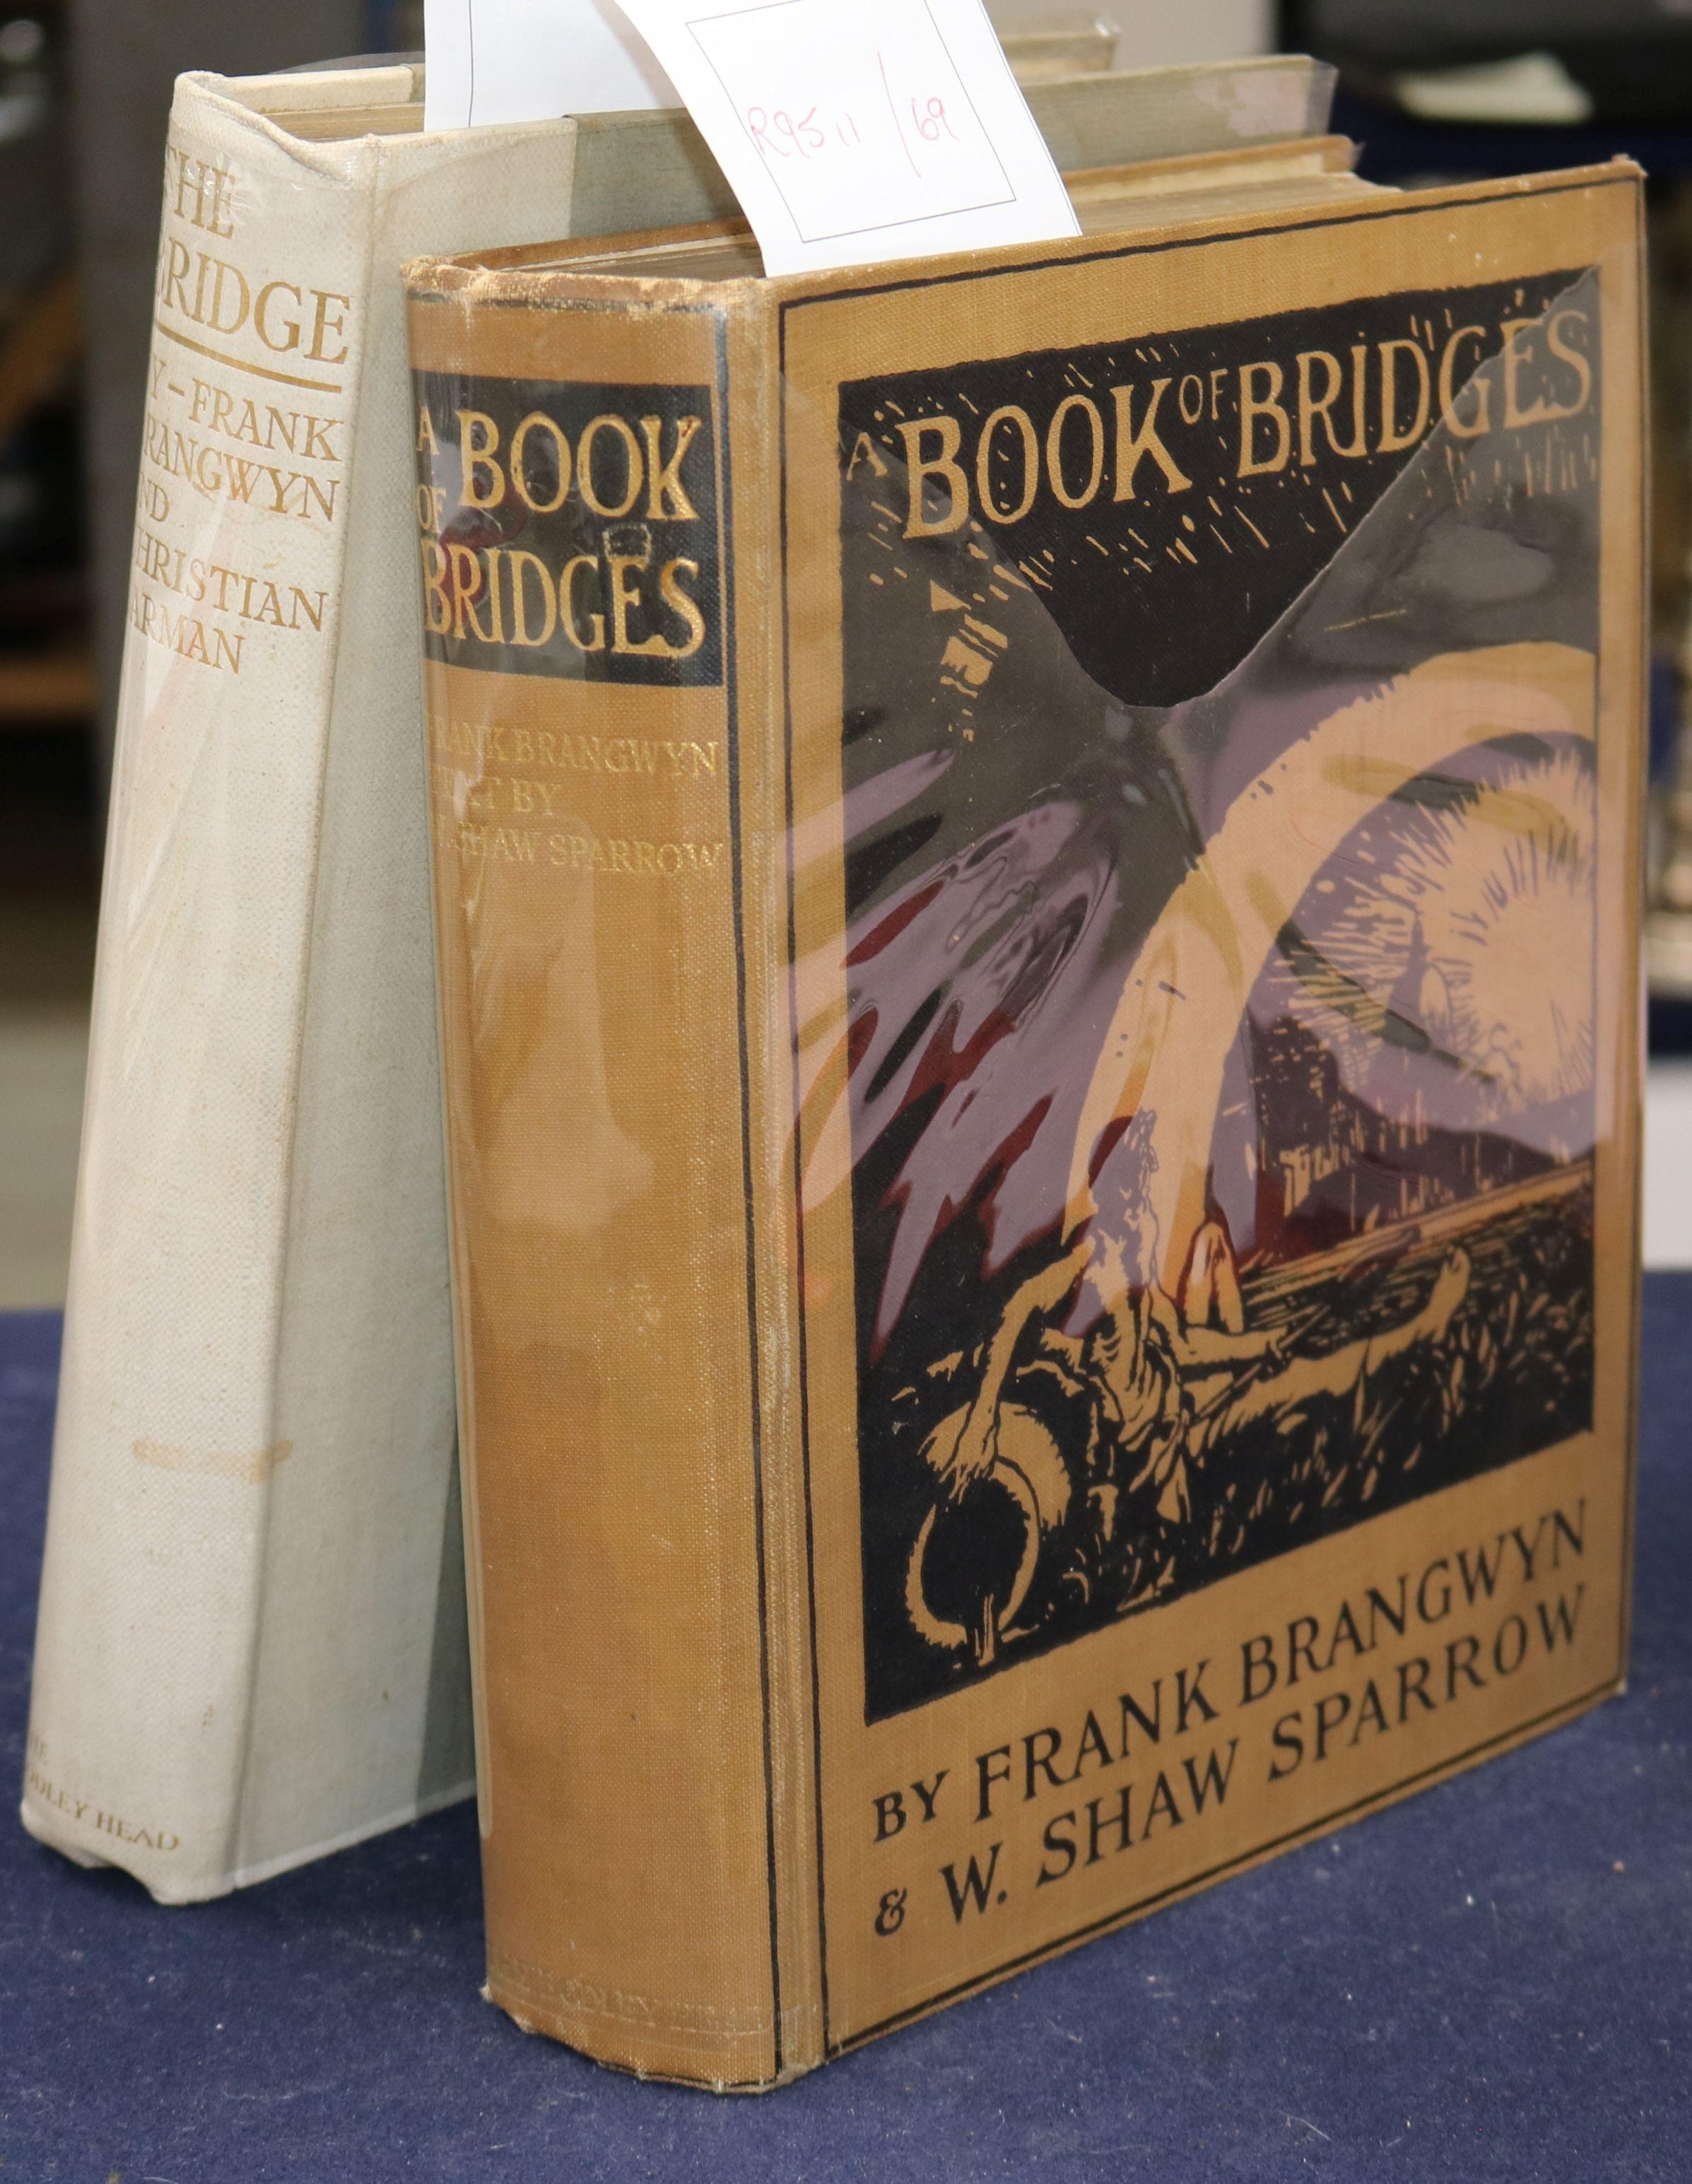 Lot 4 - Barman, Christian - The Bridge ... , one of 125, illustrated by Frank Brangwyn, 4to, original half